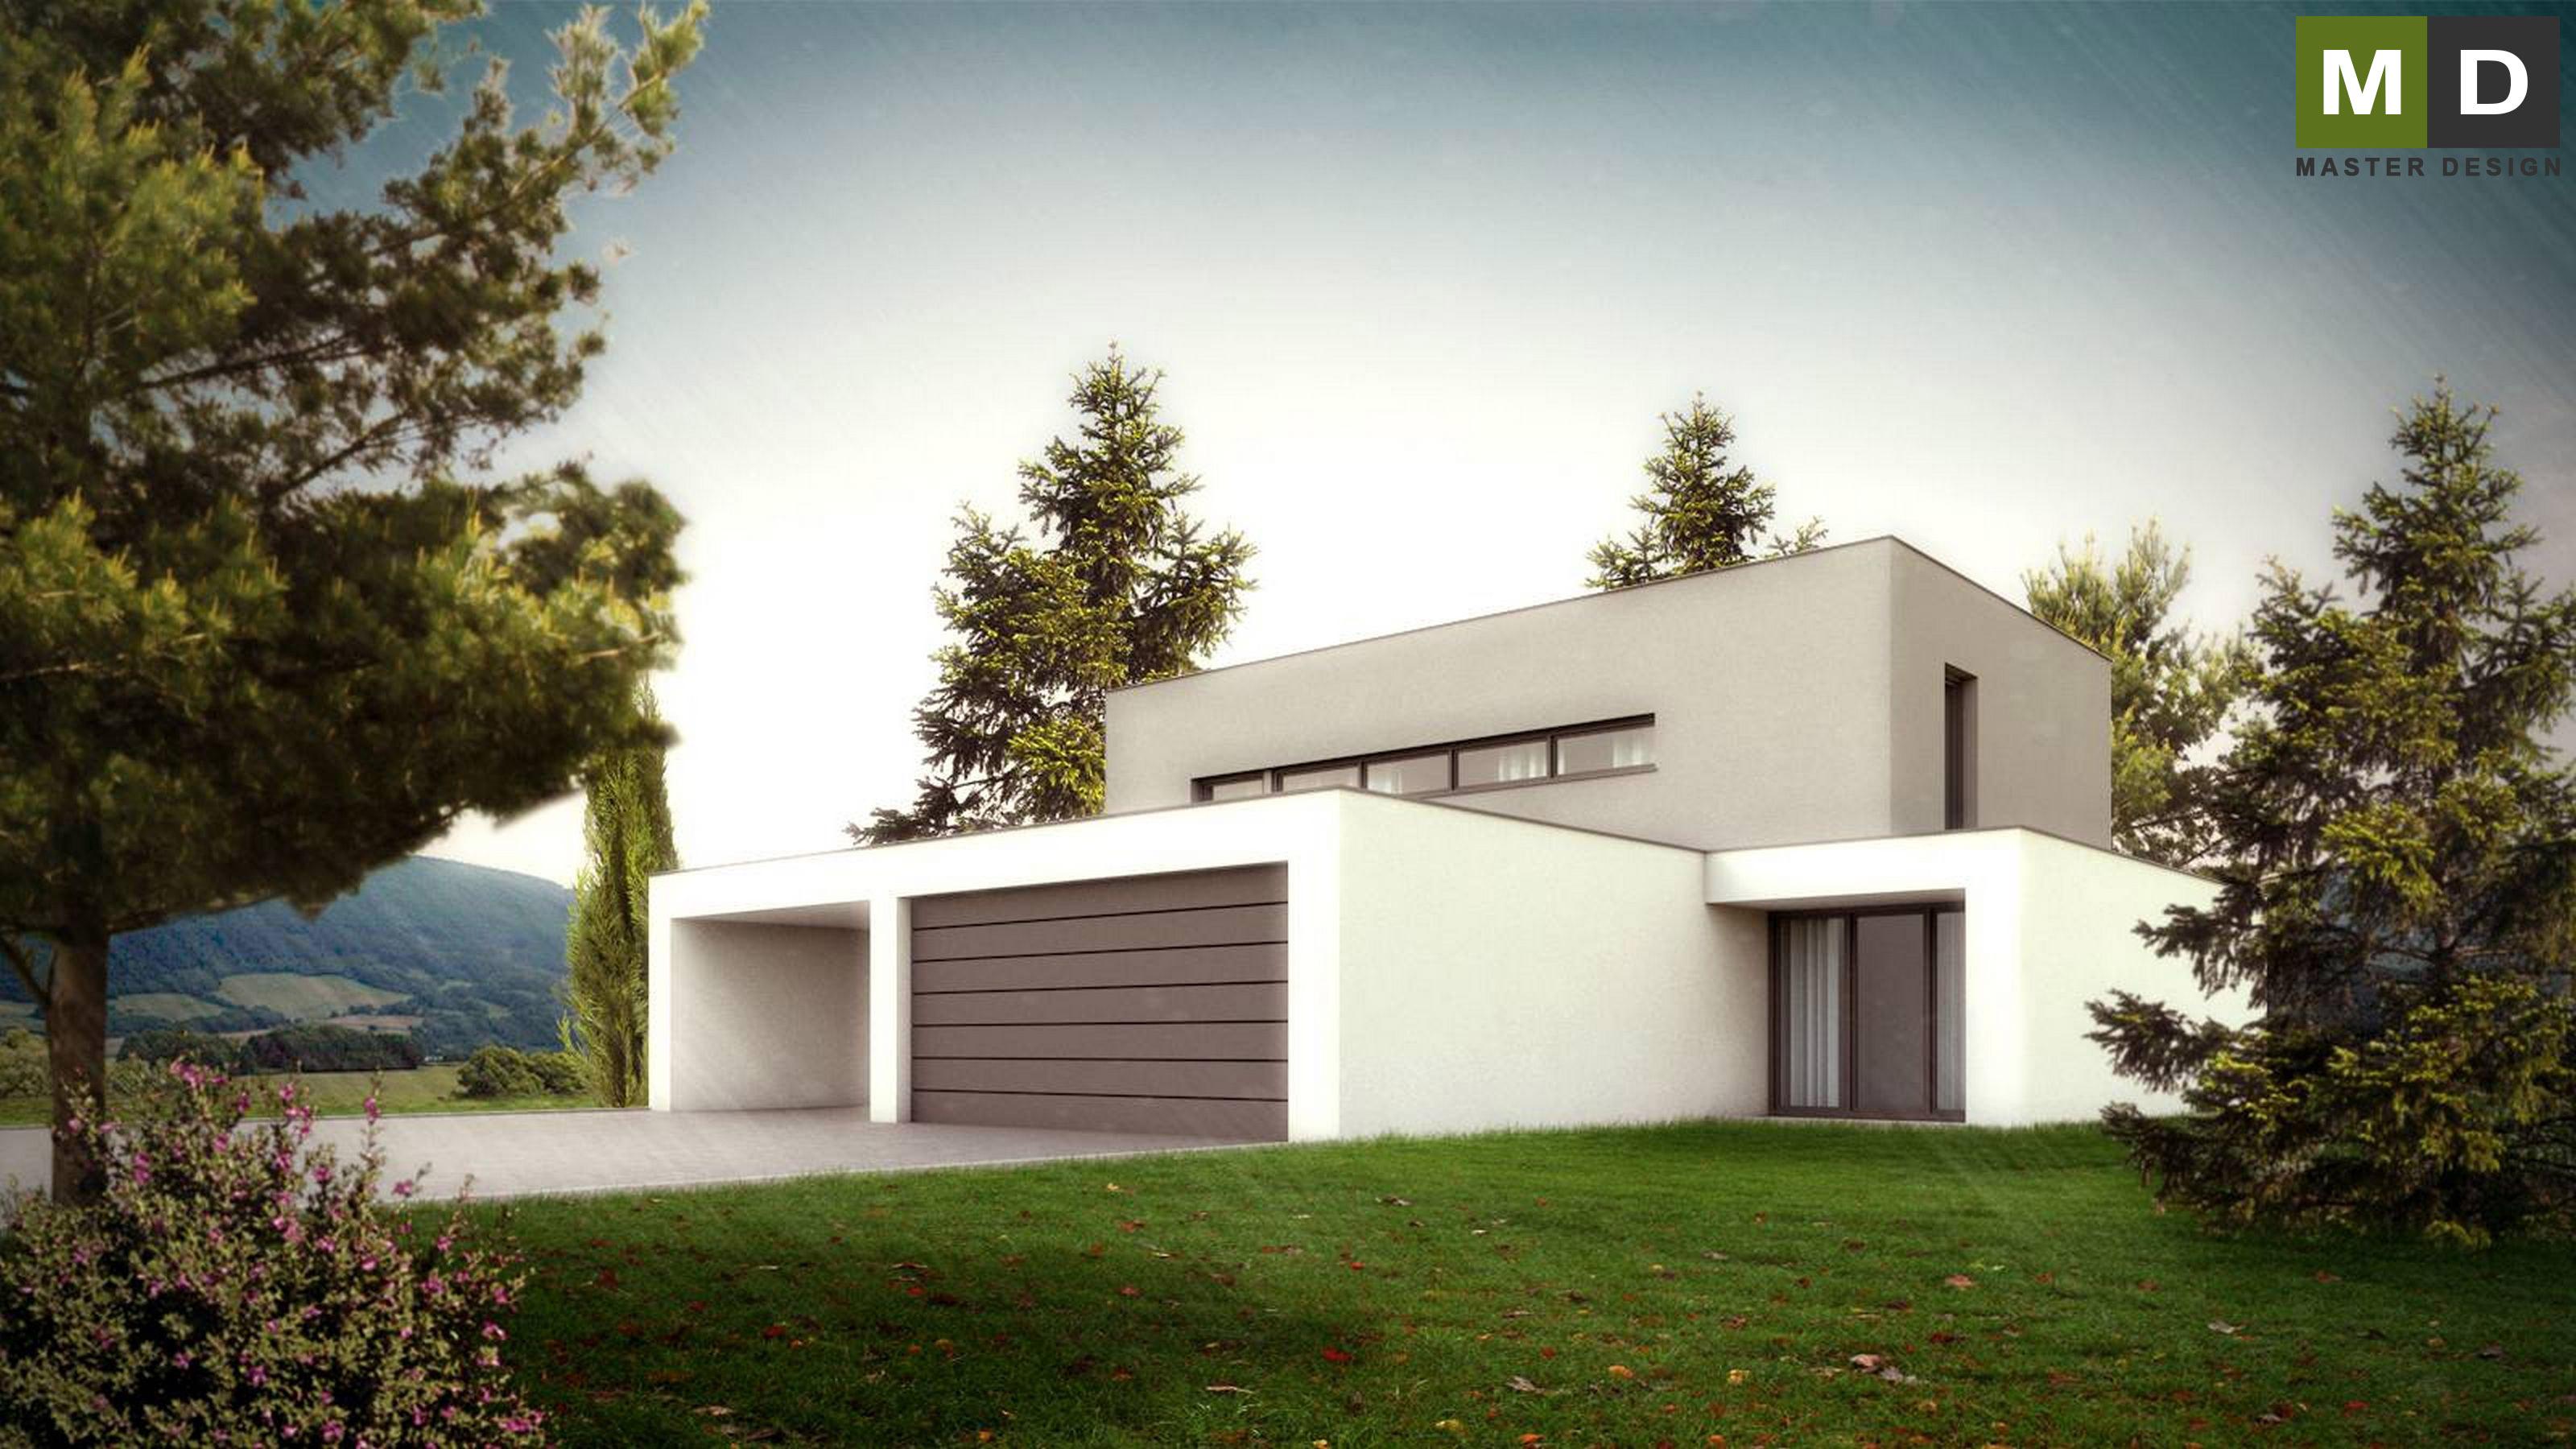 Home Design Zlín Part - 20: ... Luxury Low-energy L-shaped House With A Green Roof - Zlín - Vizualizace  ...